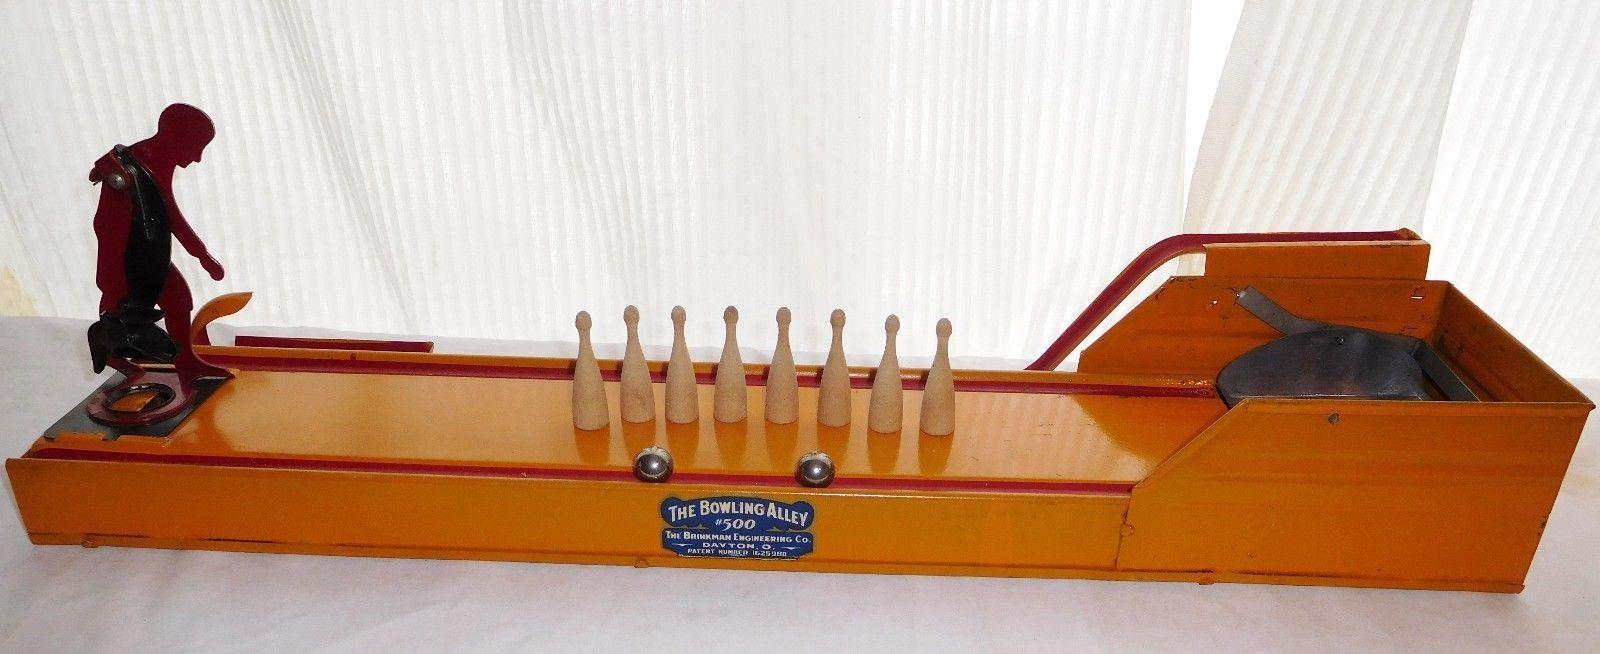 Vintage Brinkman Engineering The Bowling Alley 500 Tin Toy Dayton Ohio Tin Toys Dayton Ohio Dayton